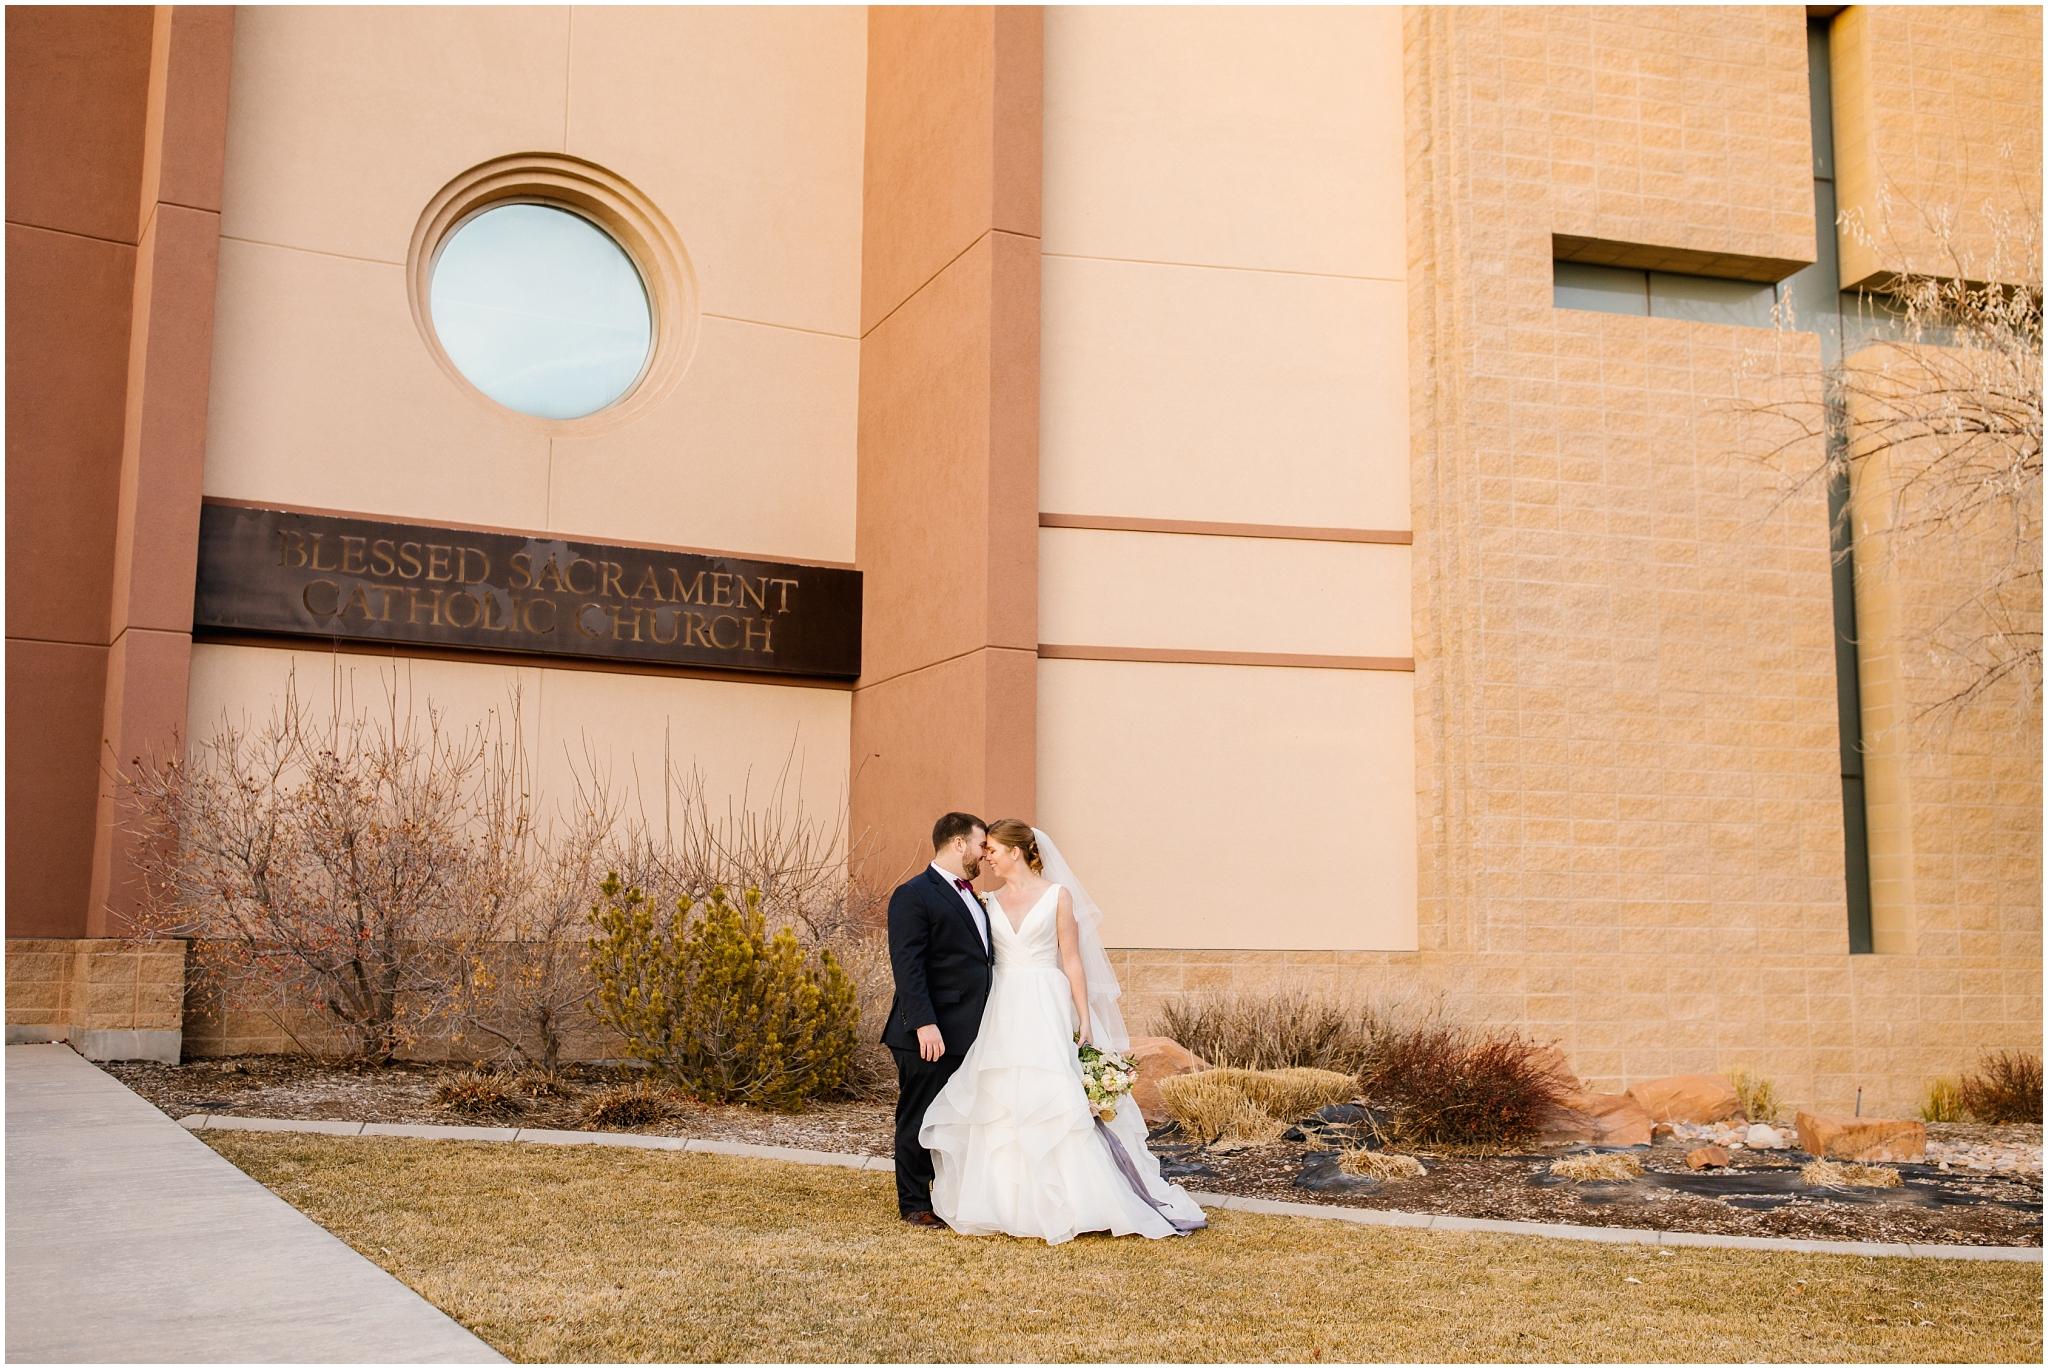 CN-Wedding-287_Lizzie-B-Imagery-Utah-Wedding-Photographer-Blessed-Sacrament-Catholic-Church-Sandy-Utah-The-Blended-Table-Salt-Lake-City.jpg